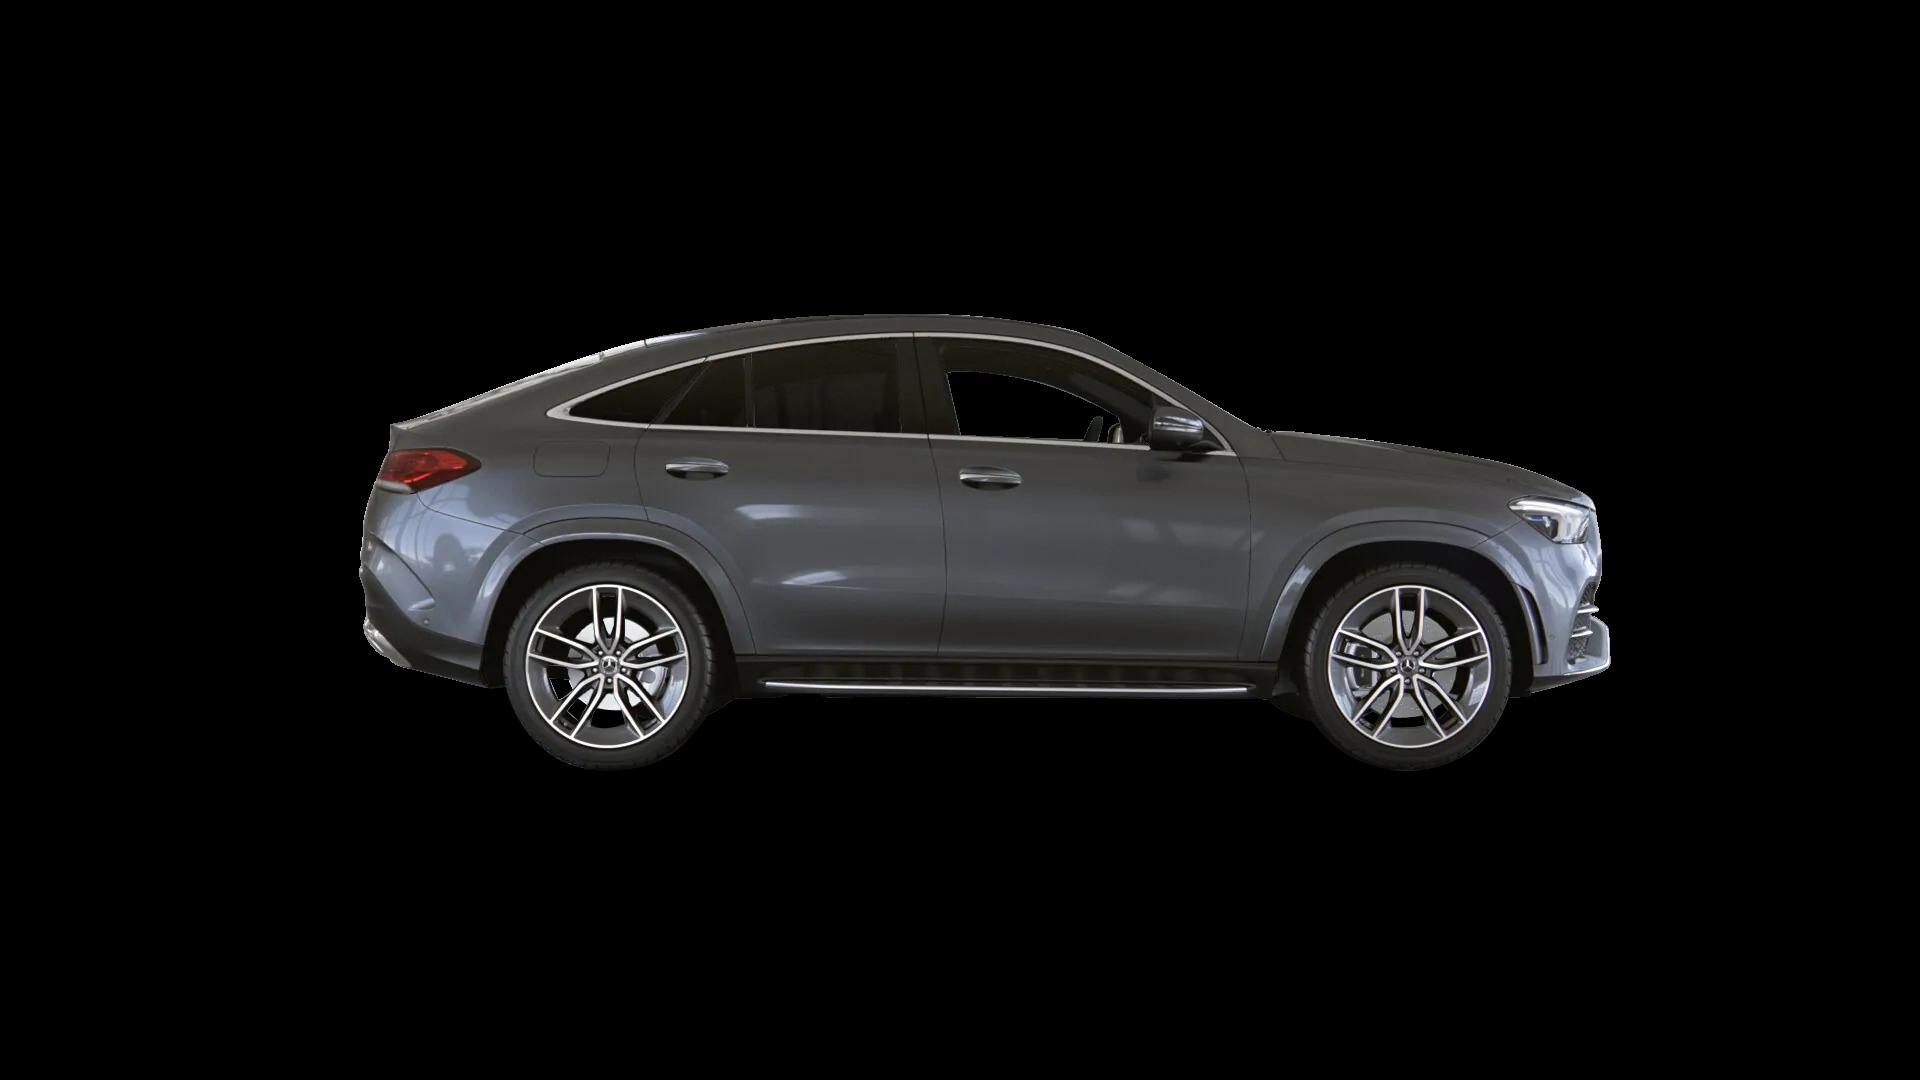 https://cogcms-images.azureedge.net/media/34886/gle-coupe-amg-line-premium-plus.png